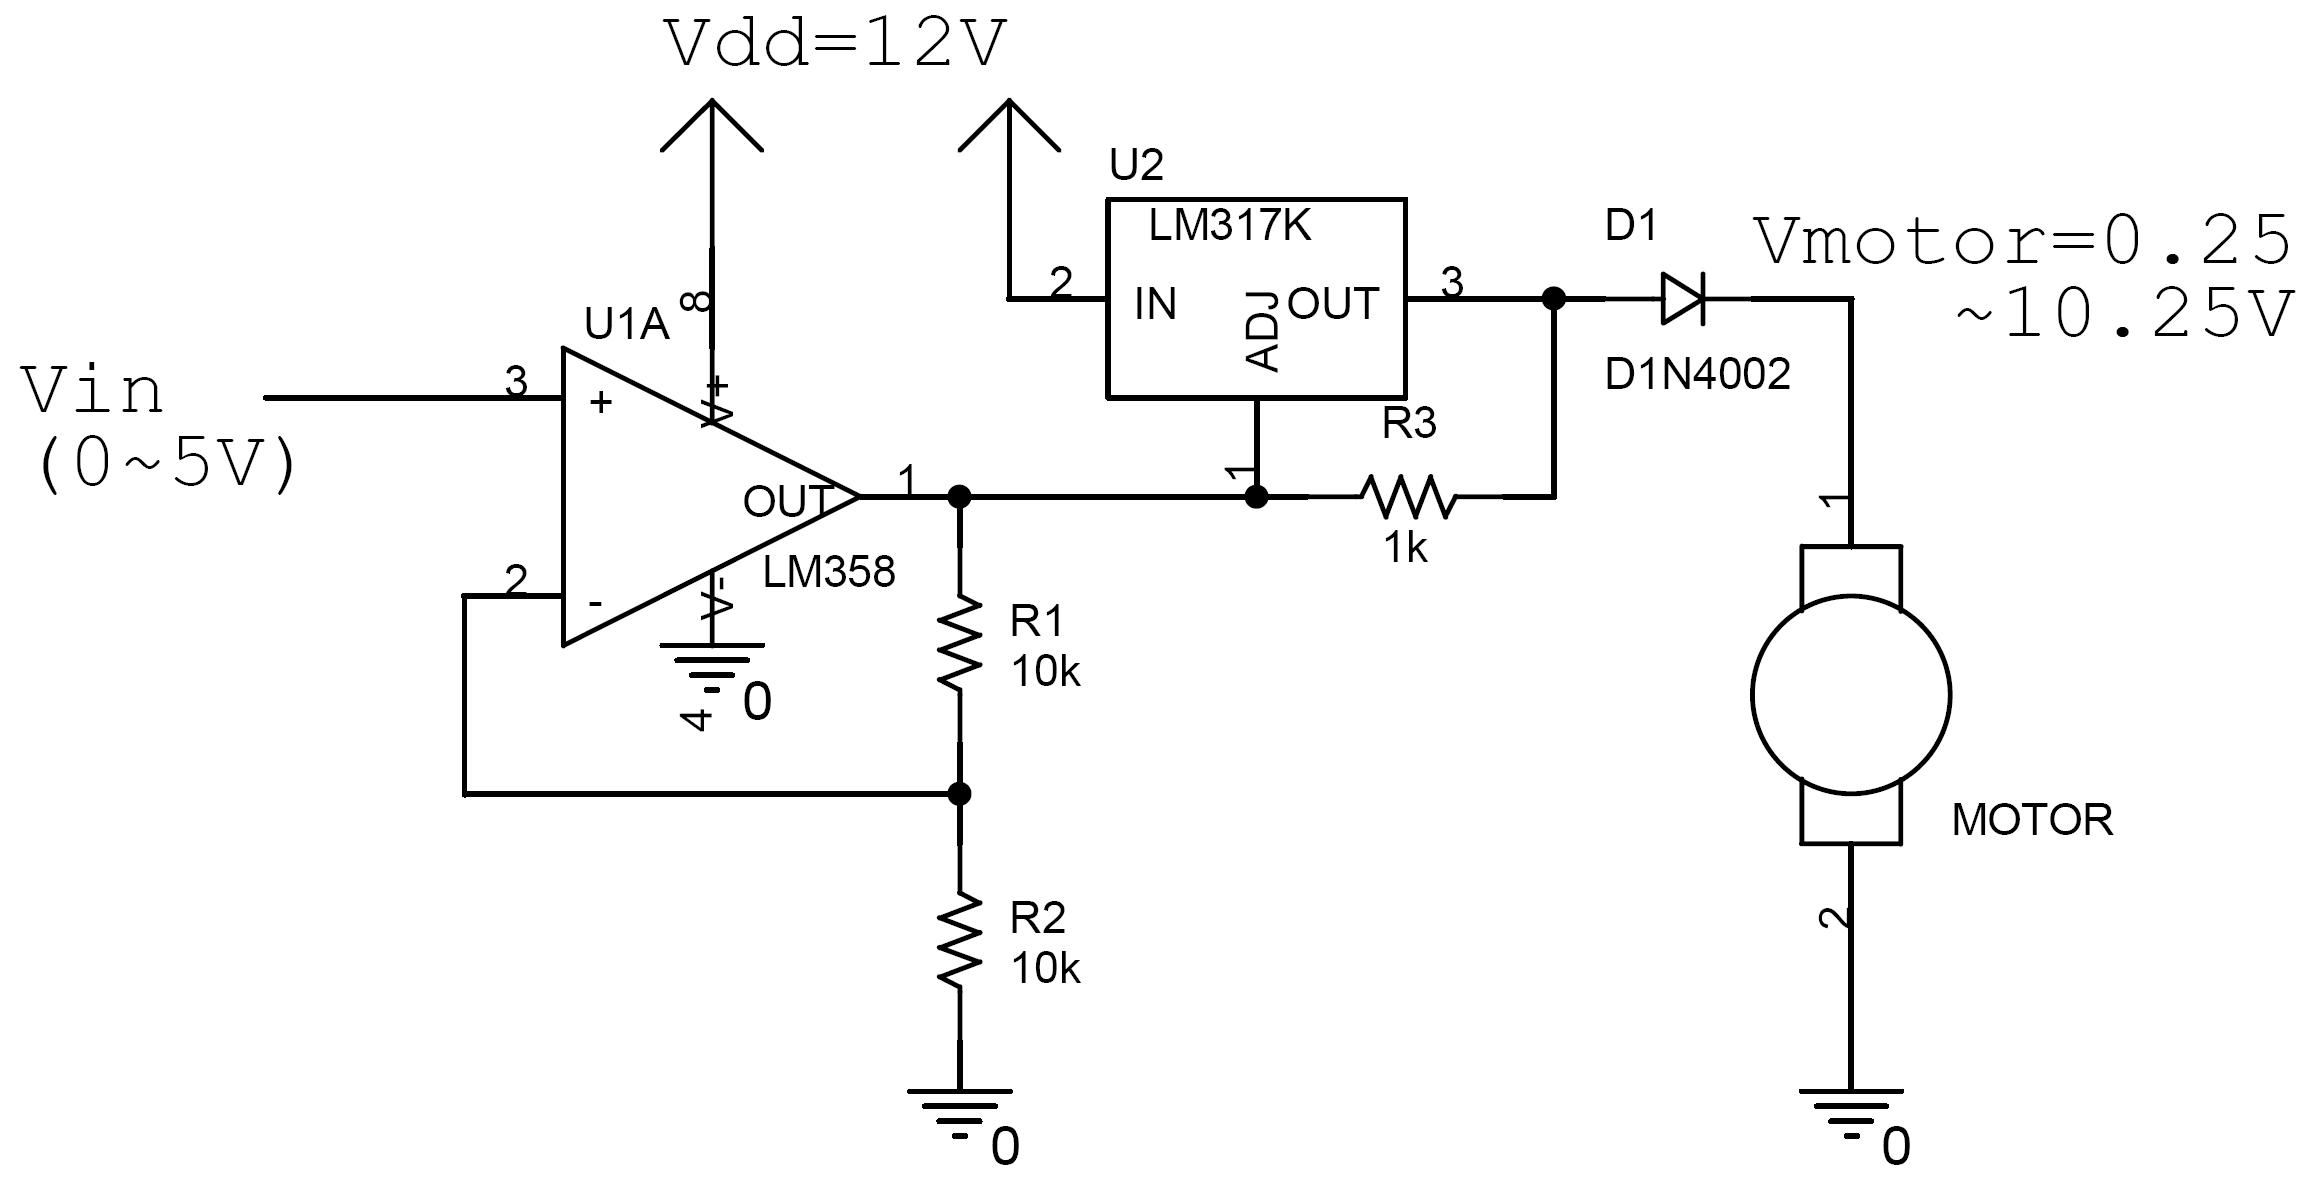 Yi Yao Dc Motor Controller And Tachometer